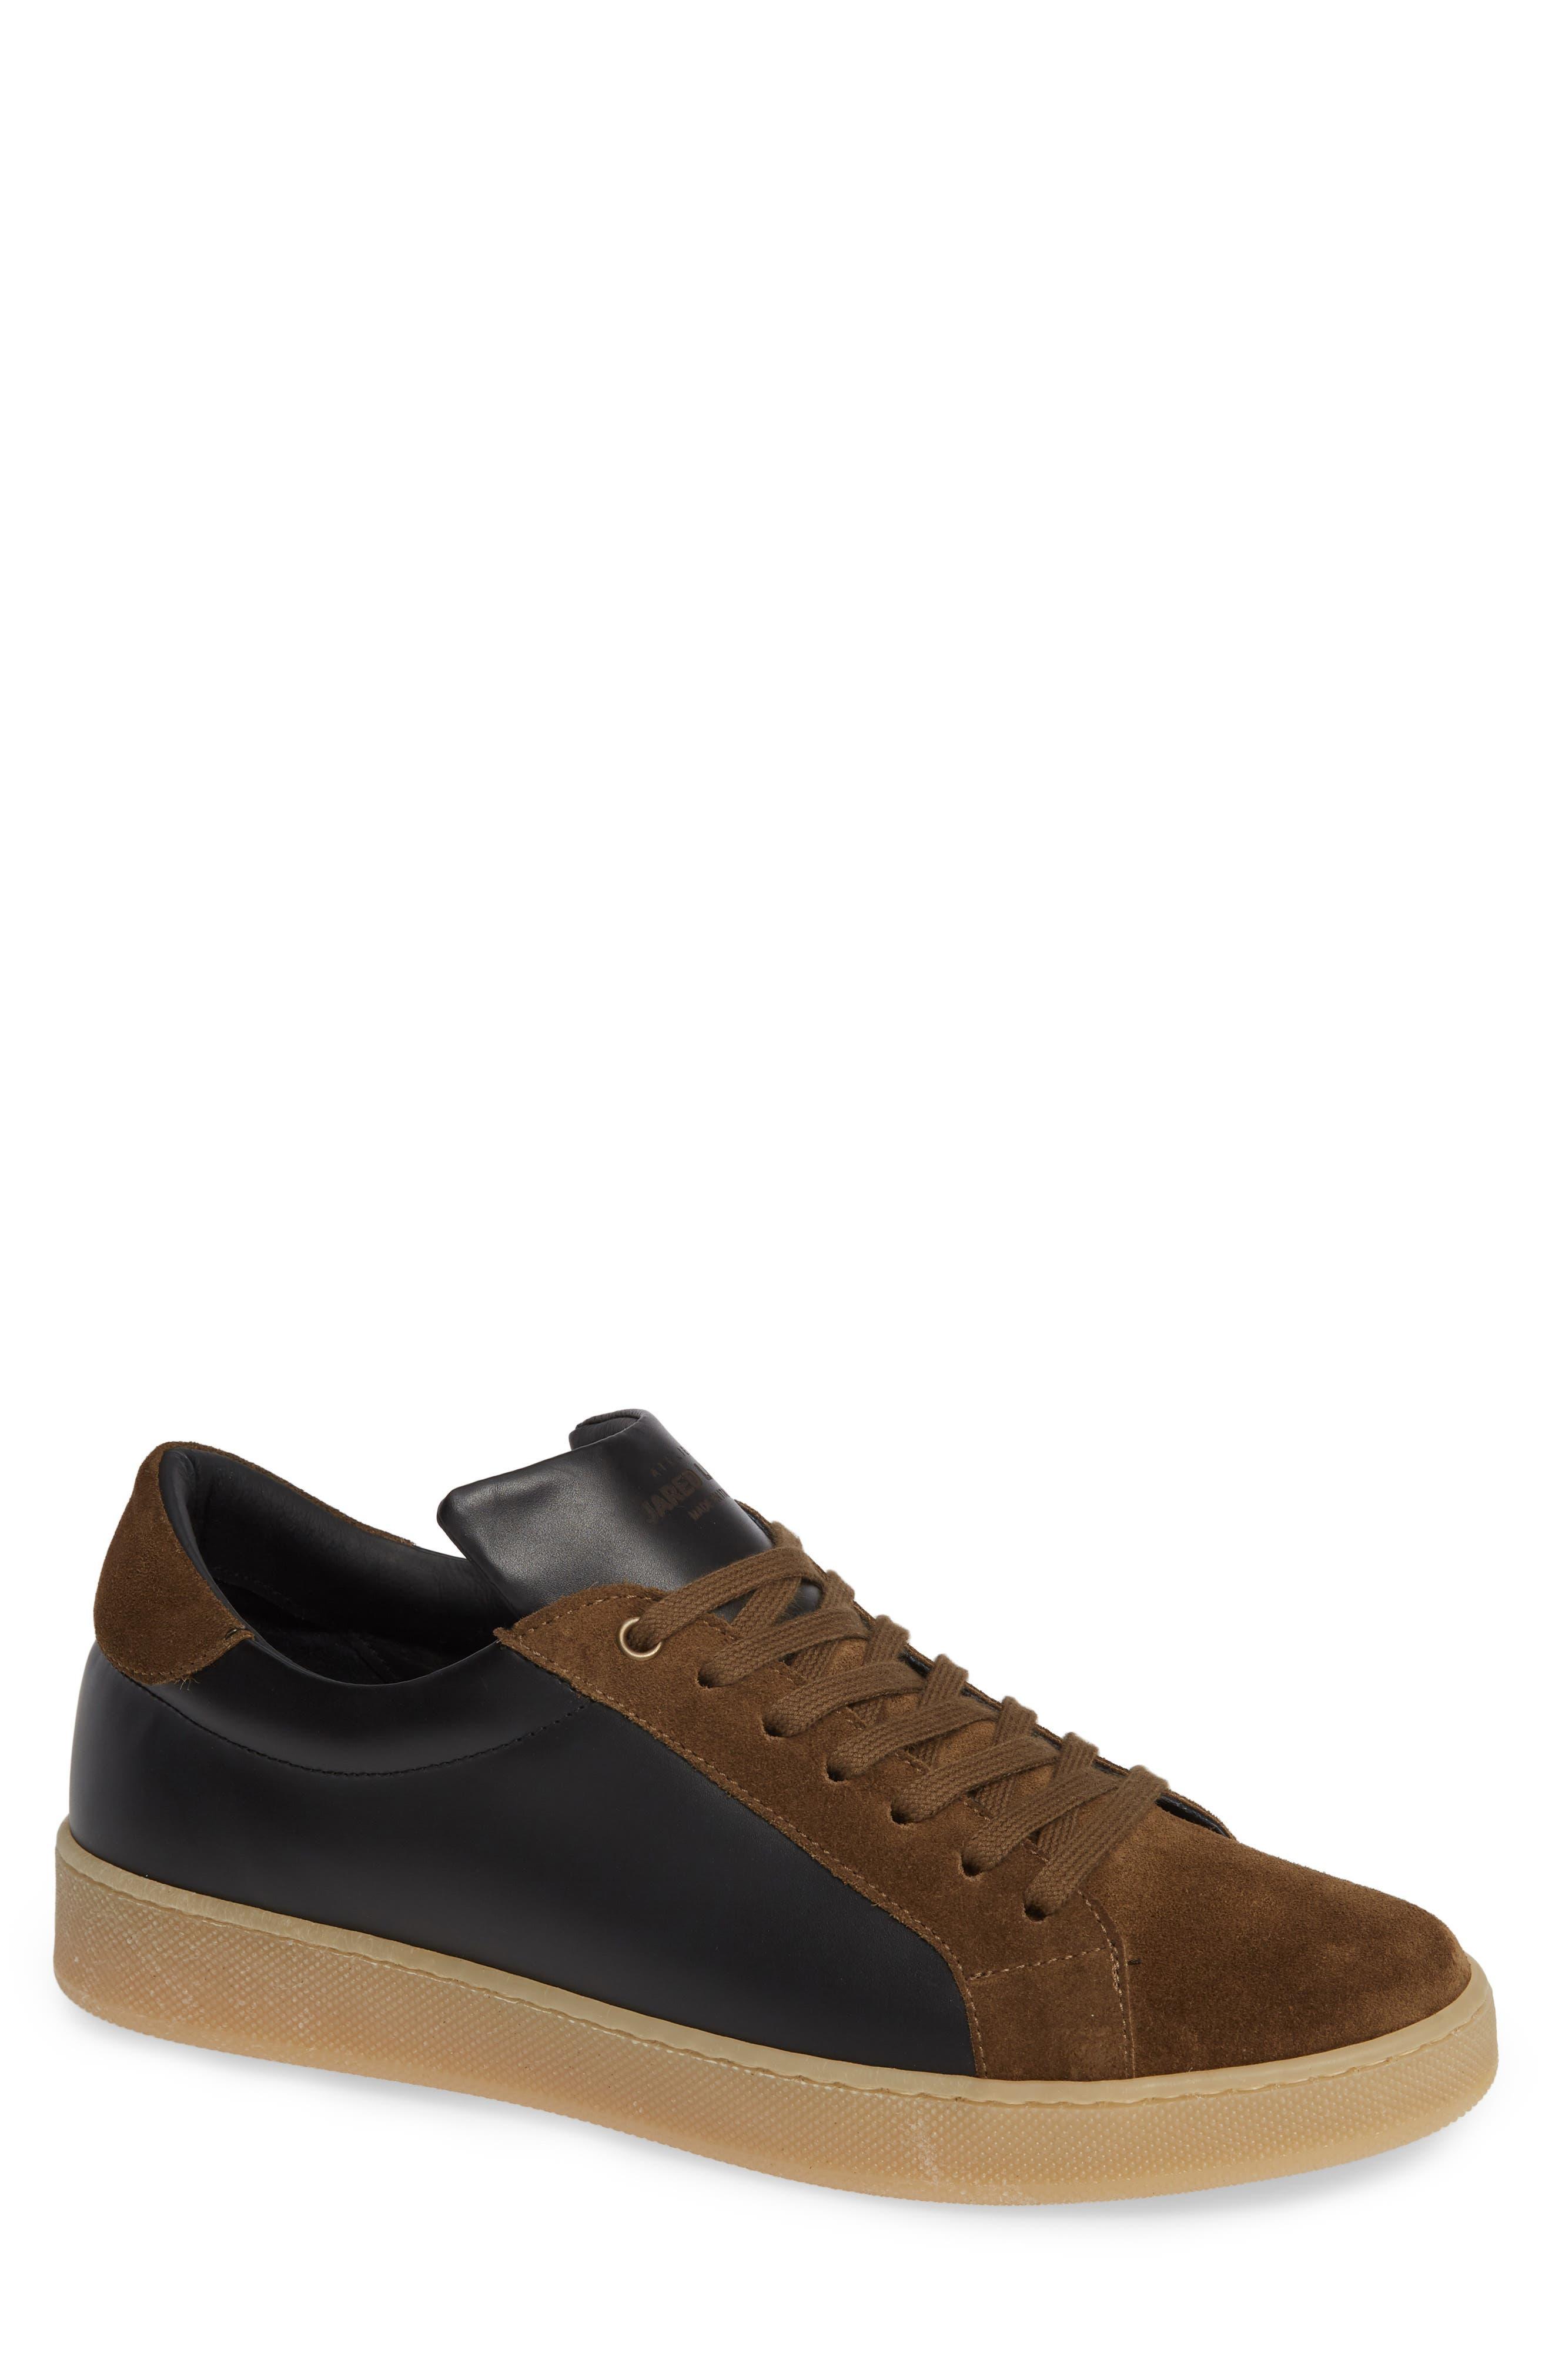 Rome Sneaker,                             Main thumbnail 1, color,                             BLACK/ GEIGE